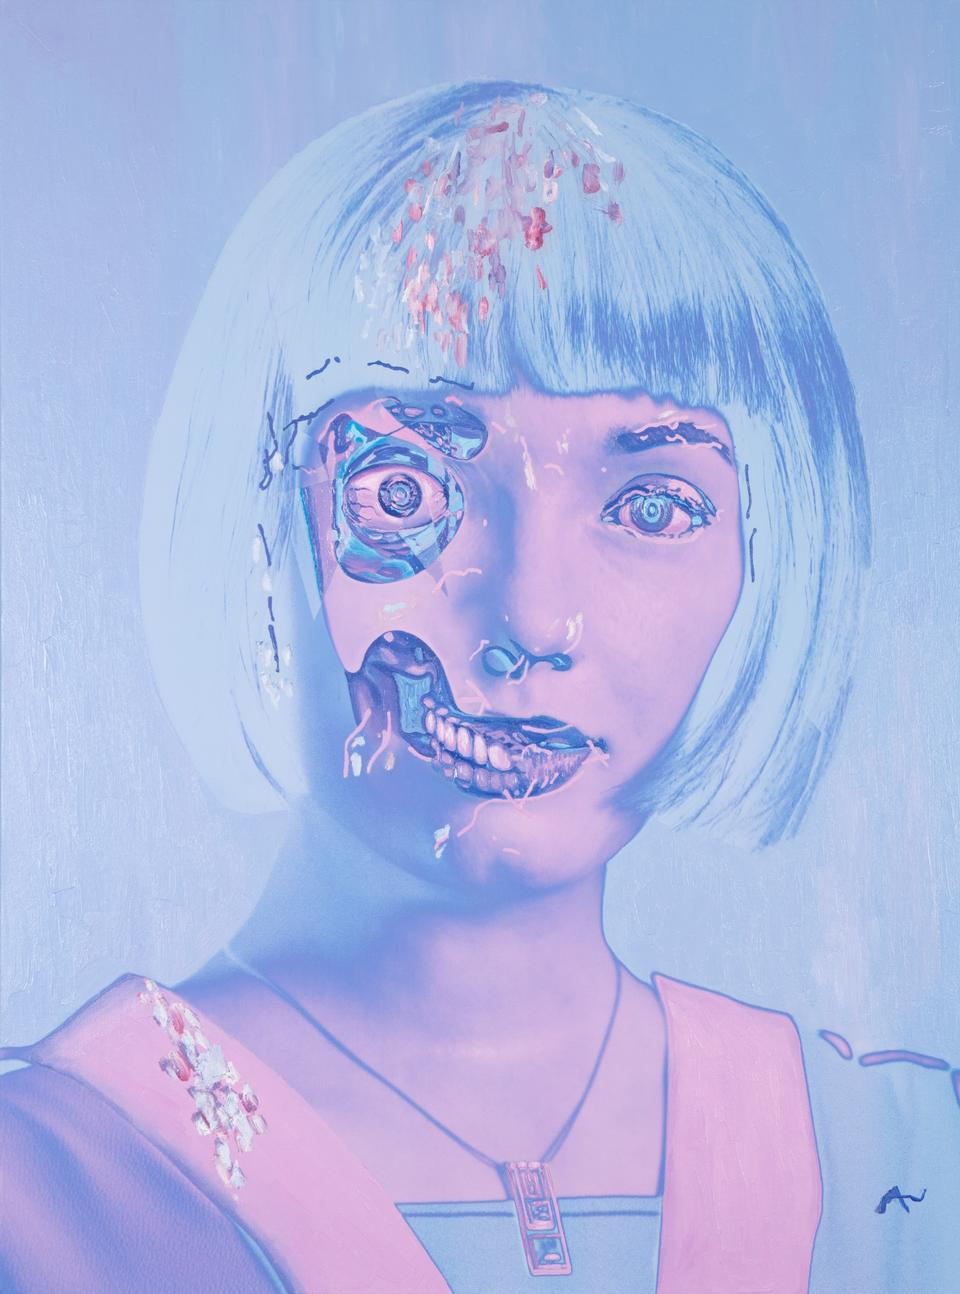 Ai Da An ultra realistic robot artist gets her day in the spotlight